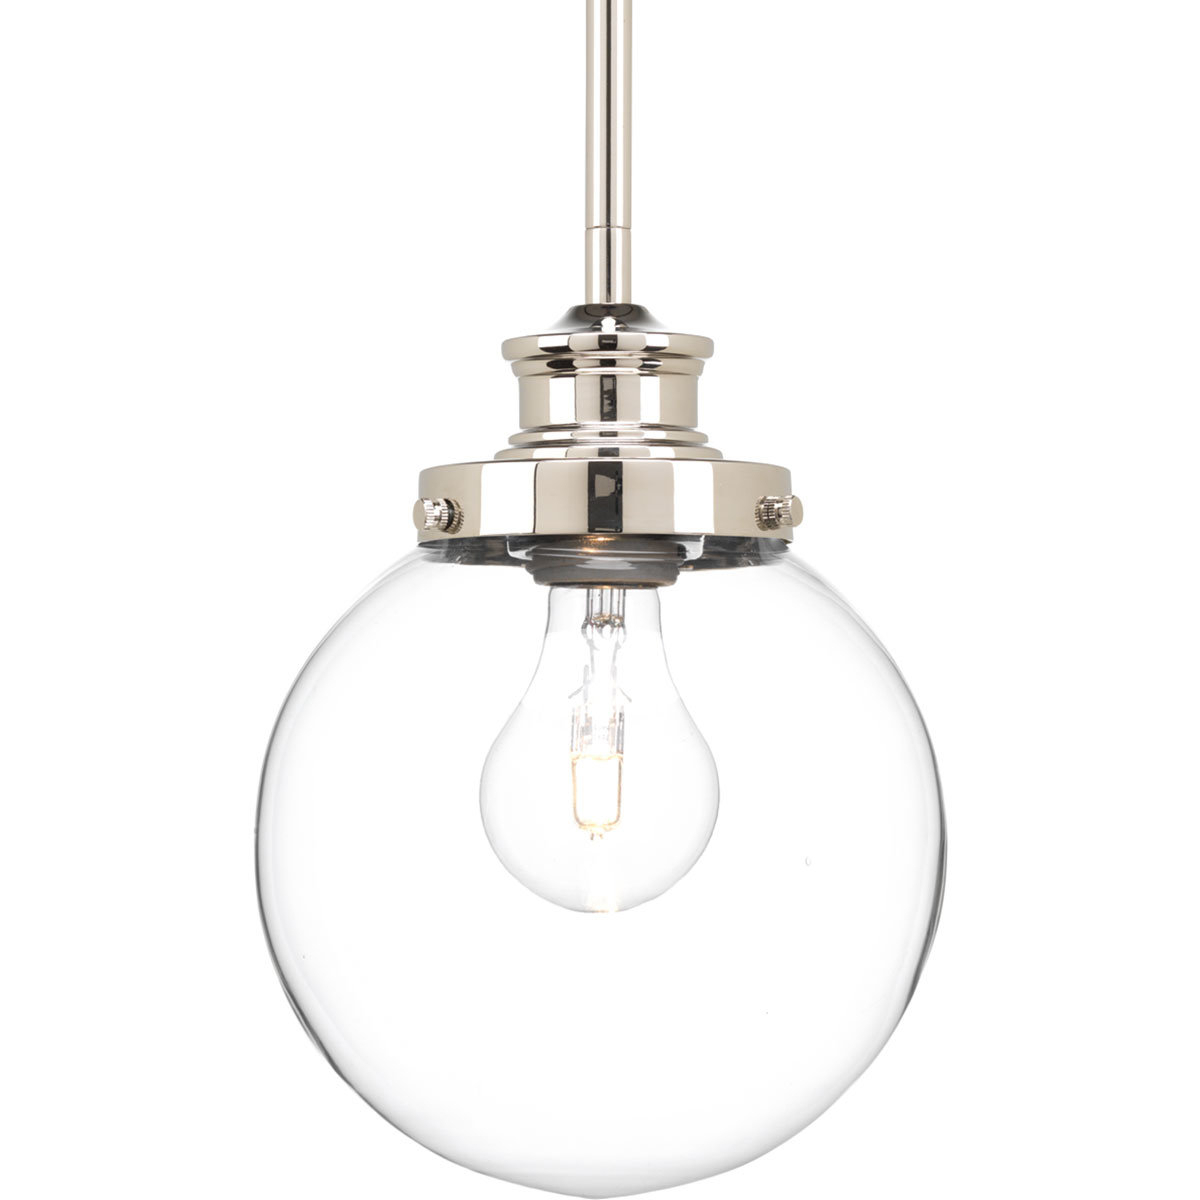 Modern Zipcode Design Pendant Lighting | Allmodern In Bainbridge 1 Light Single Cylinder Pendants (View 22 of 30)